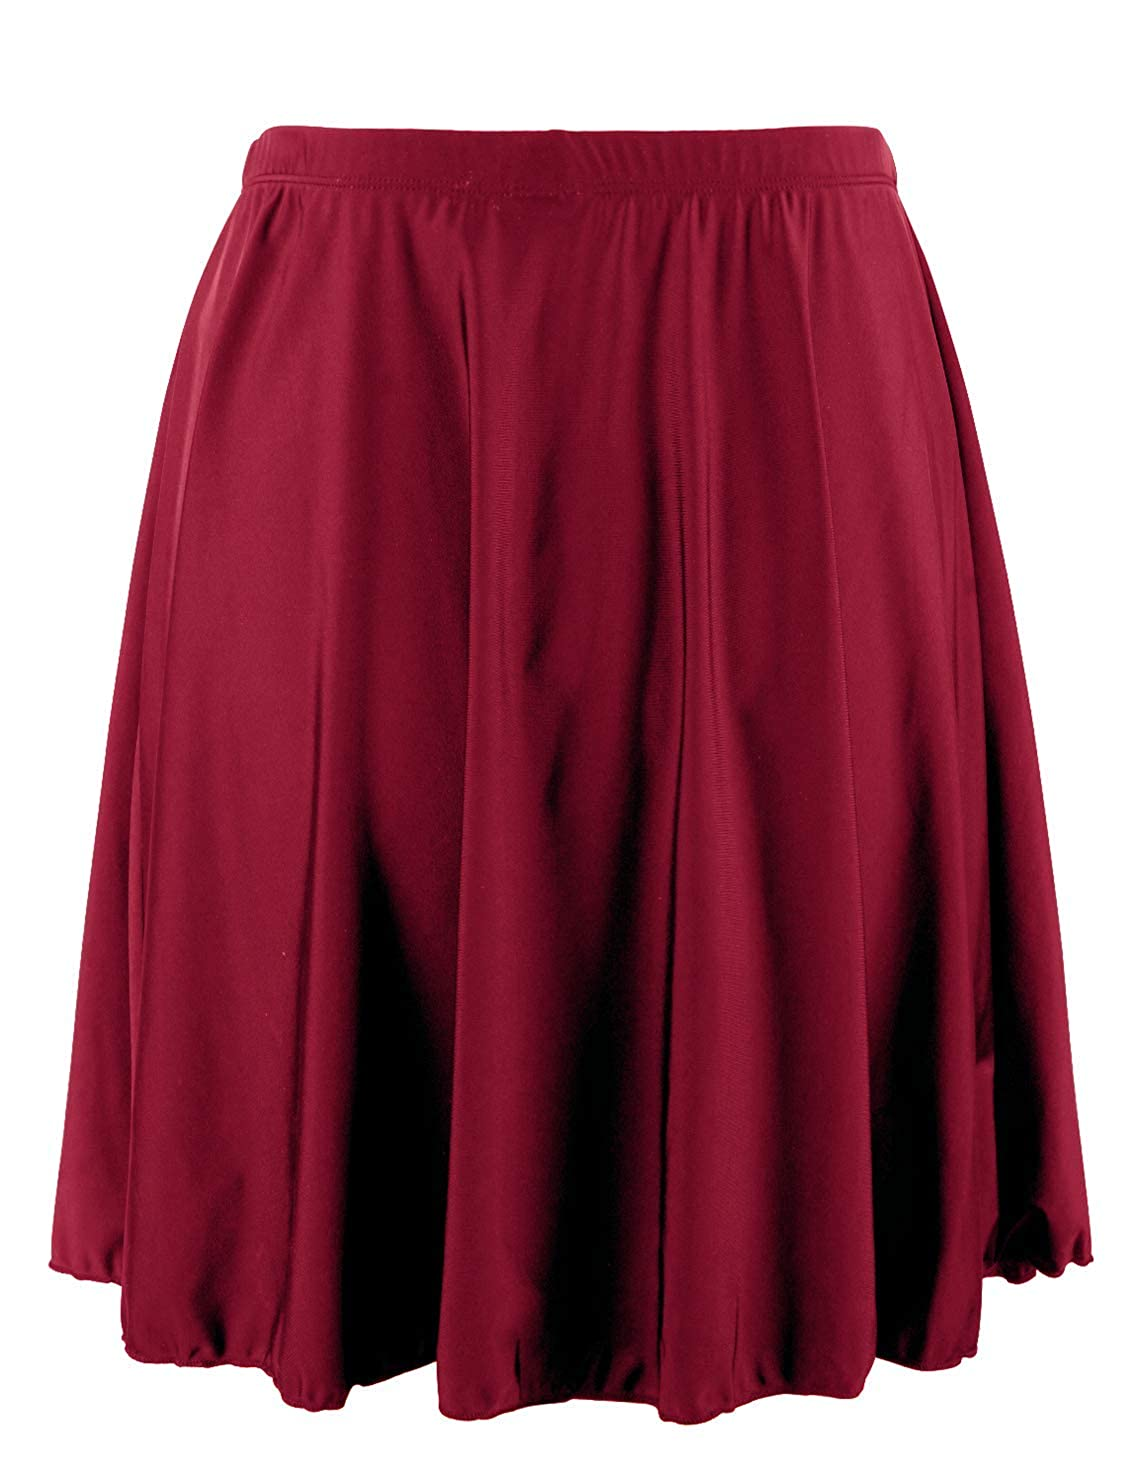 Mycoco Womens Long Swim Skirt UV 50 High Waist Swim Bottom Multi-Purpose Athletic Sports Tankini Bottom